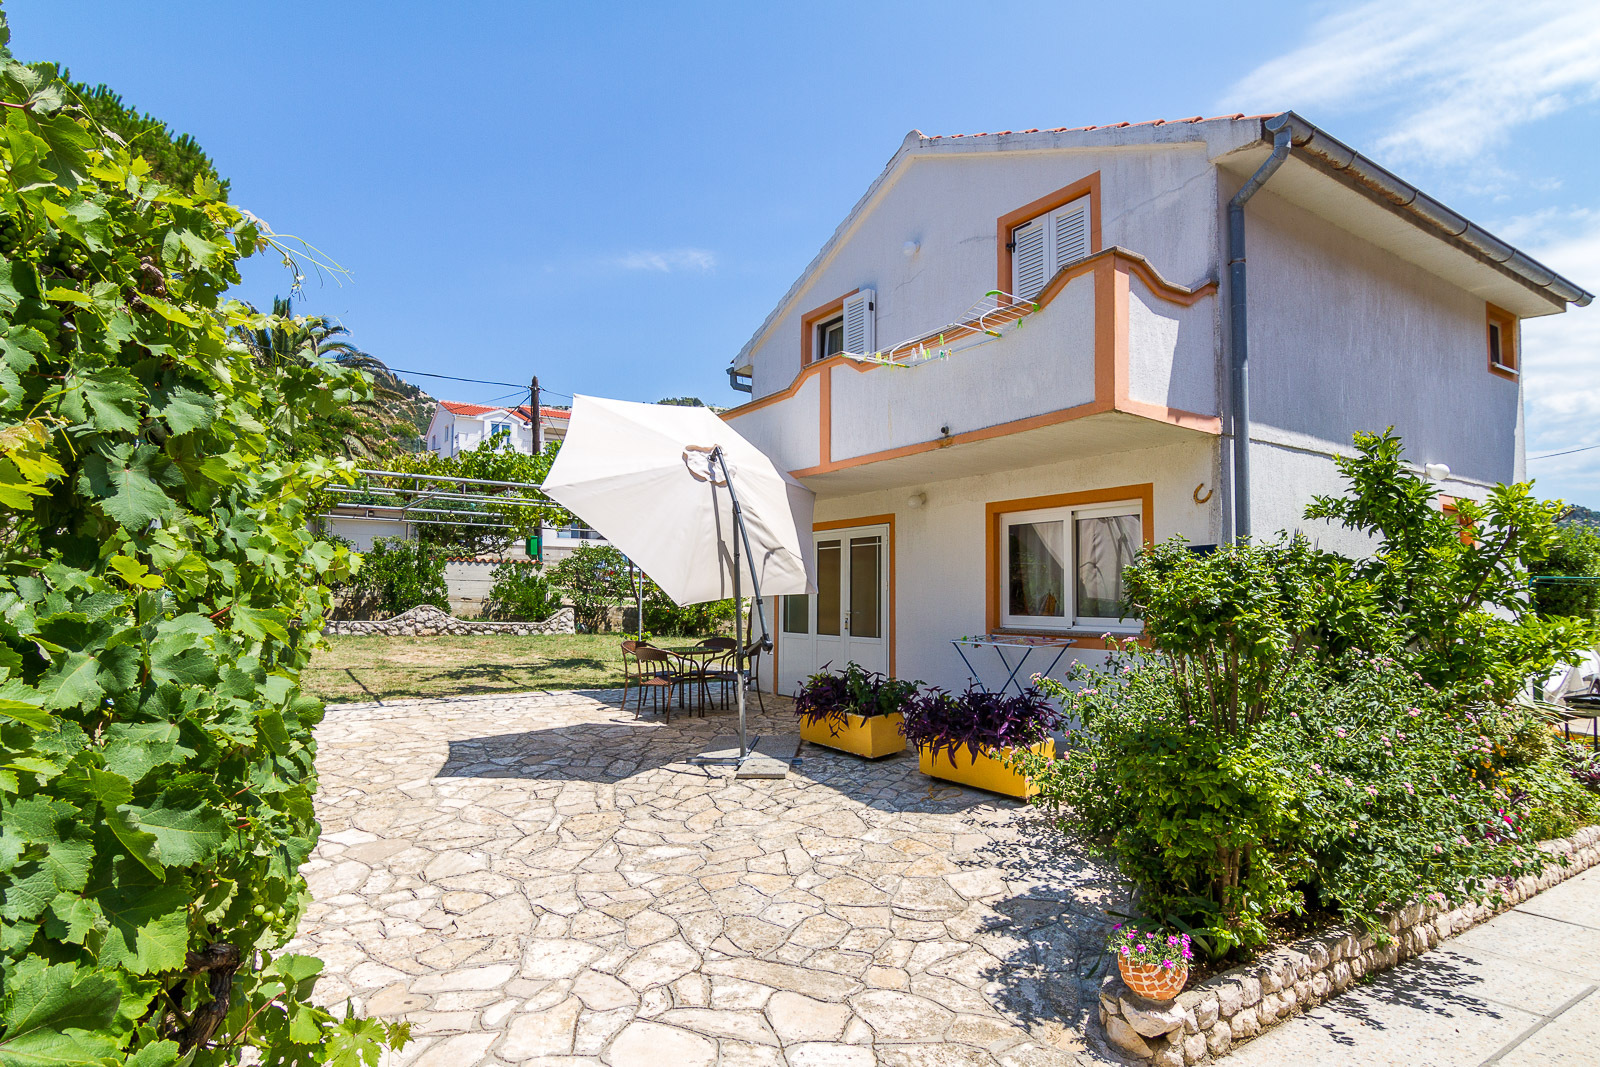 Aпартамент Apartment Anđeo A4 Barbat, Island Rab 51780, Barbat na Rabu, Rab, Primorsko-goranska